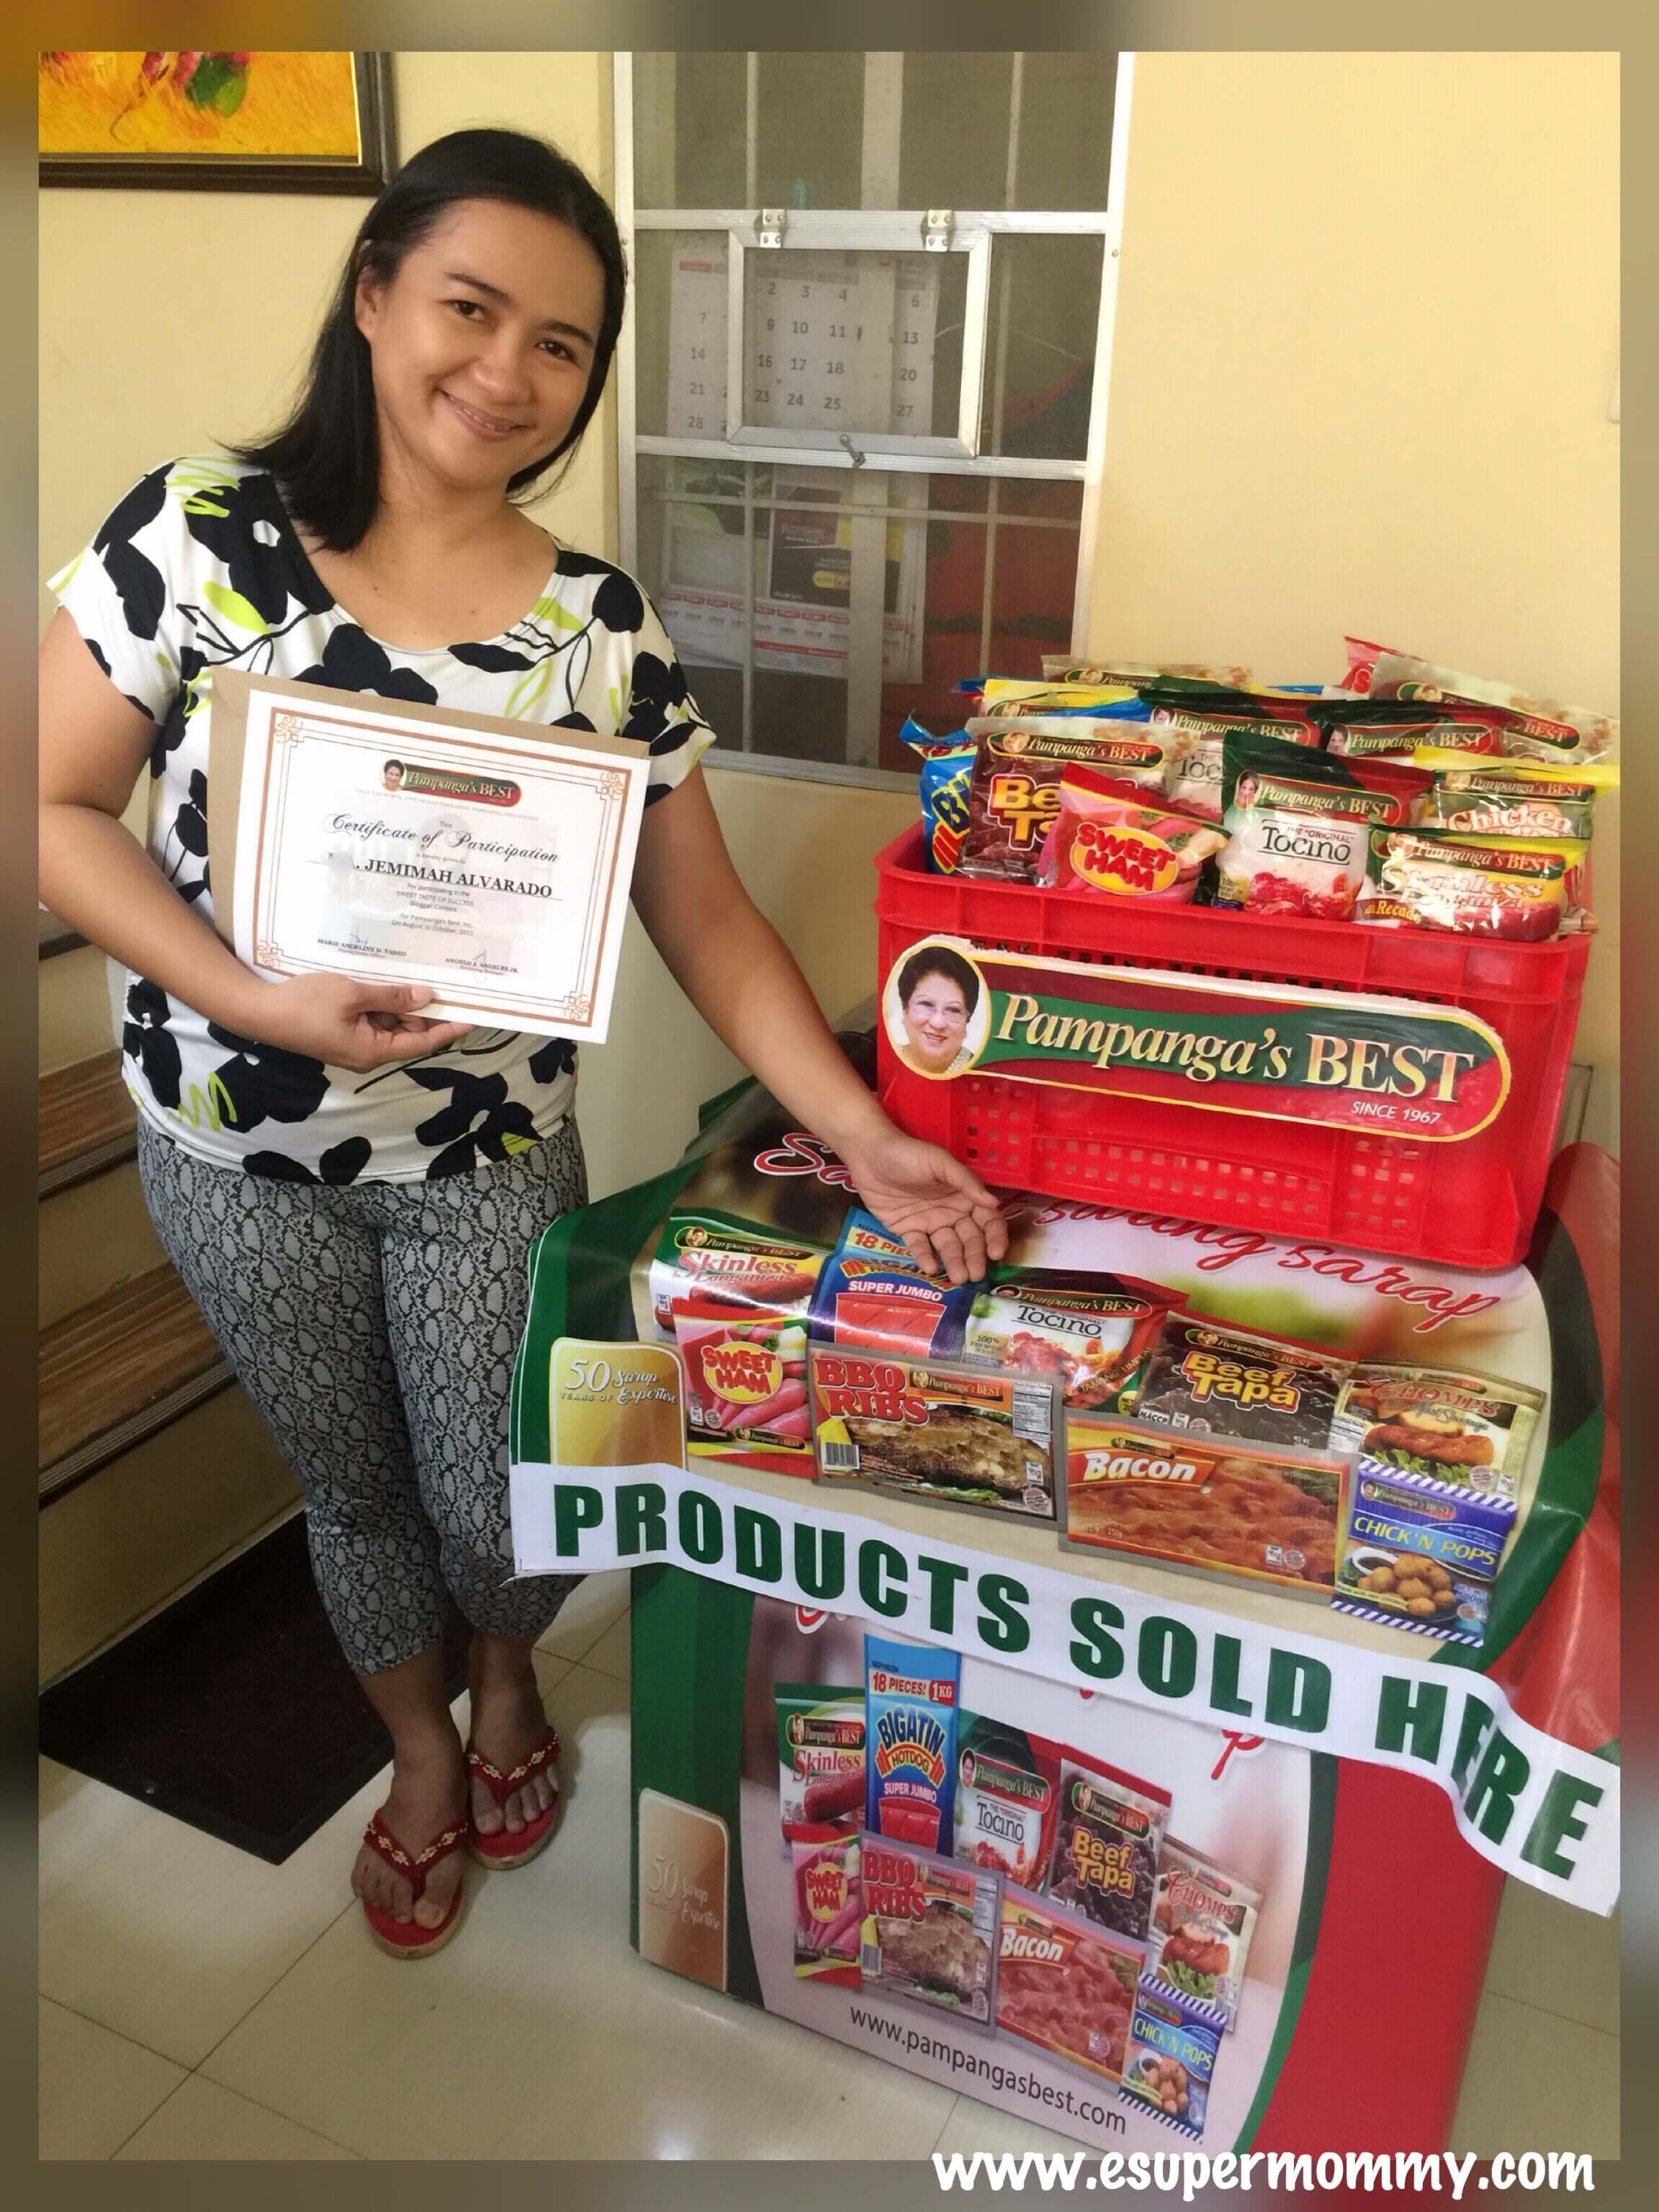 Pampanga's Best Sweet Taste of Success